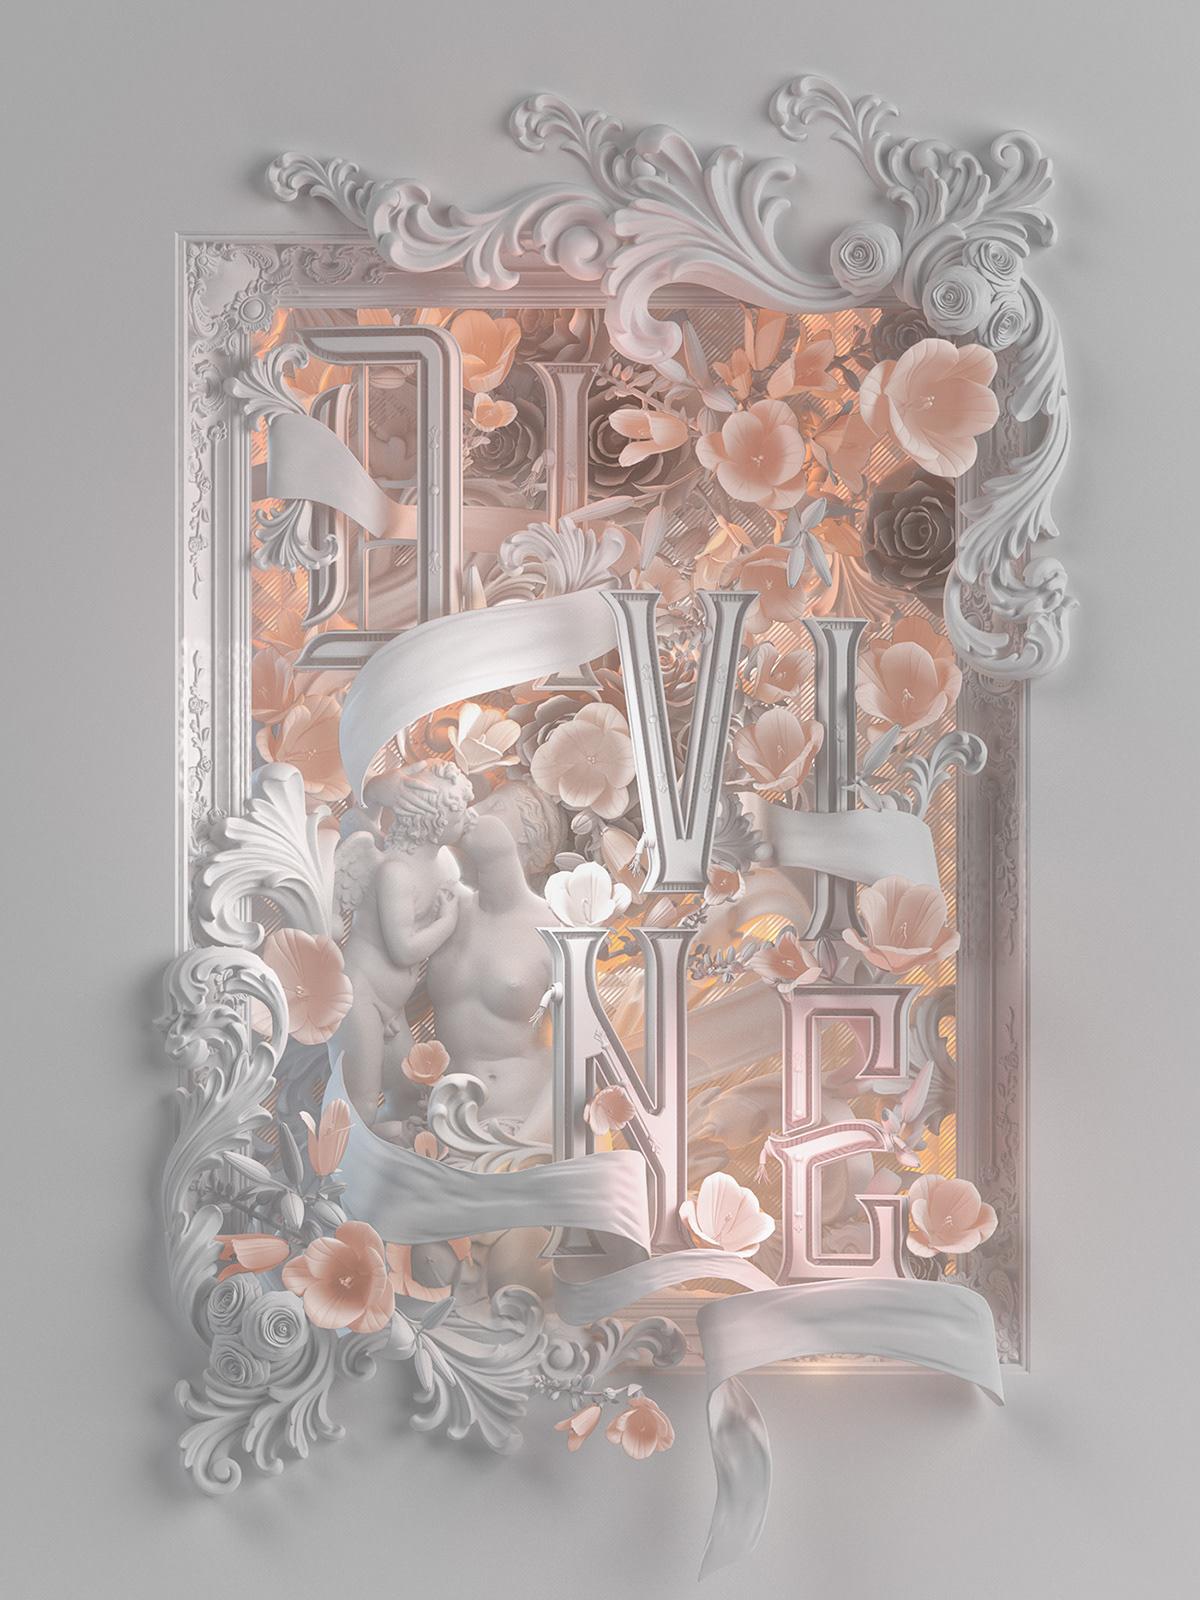 heaven 3D Type Acanthus Victorian cupid venus Flowers scroll lettering